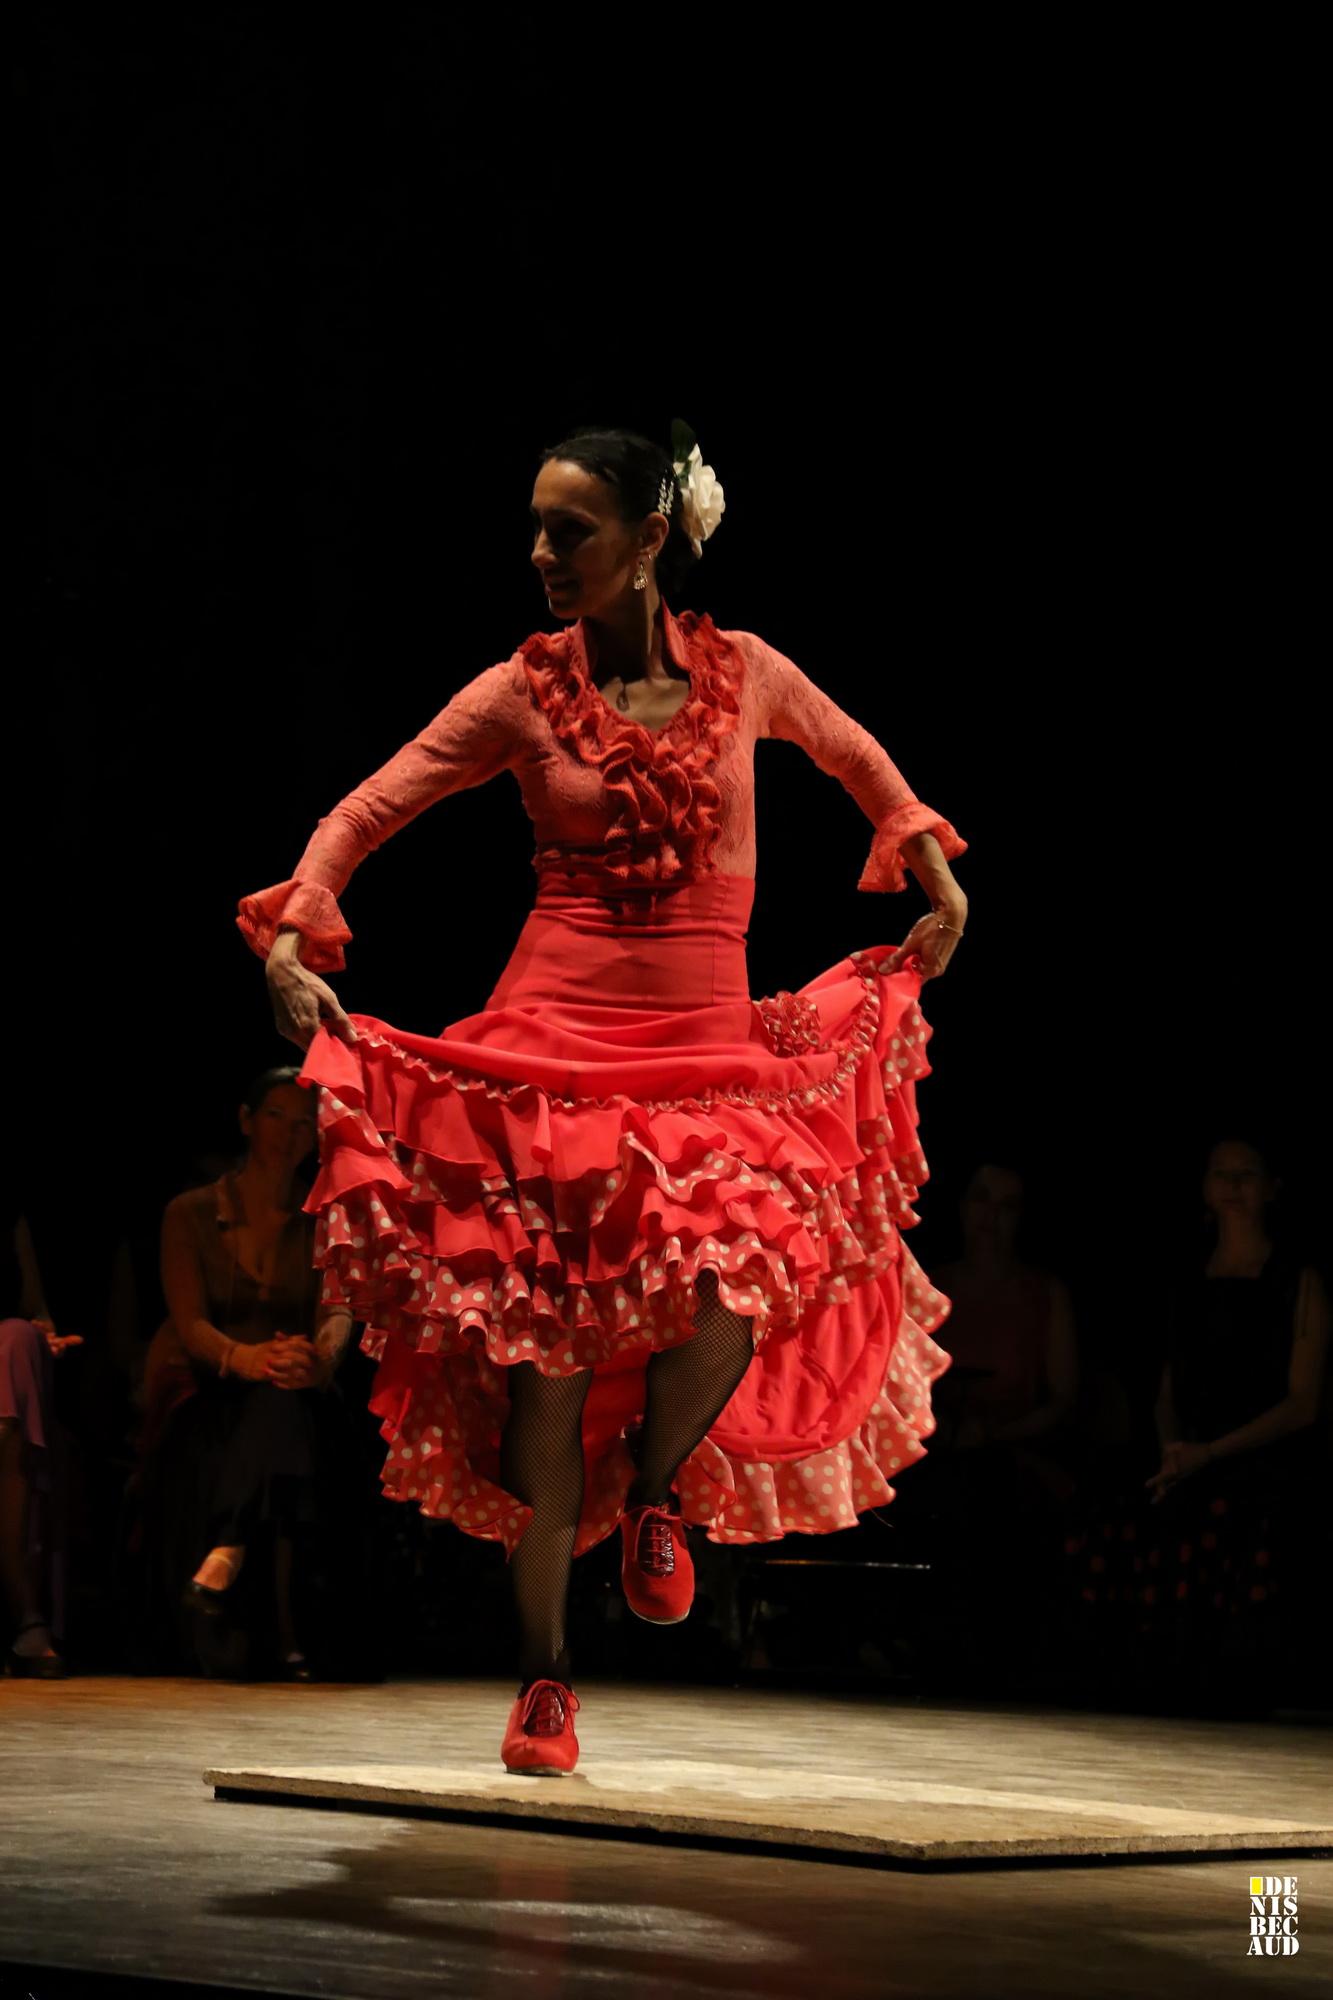 Danseuse flamenco Annecy